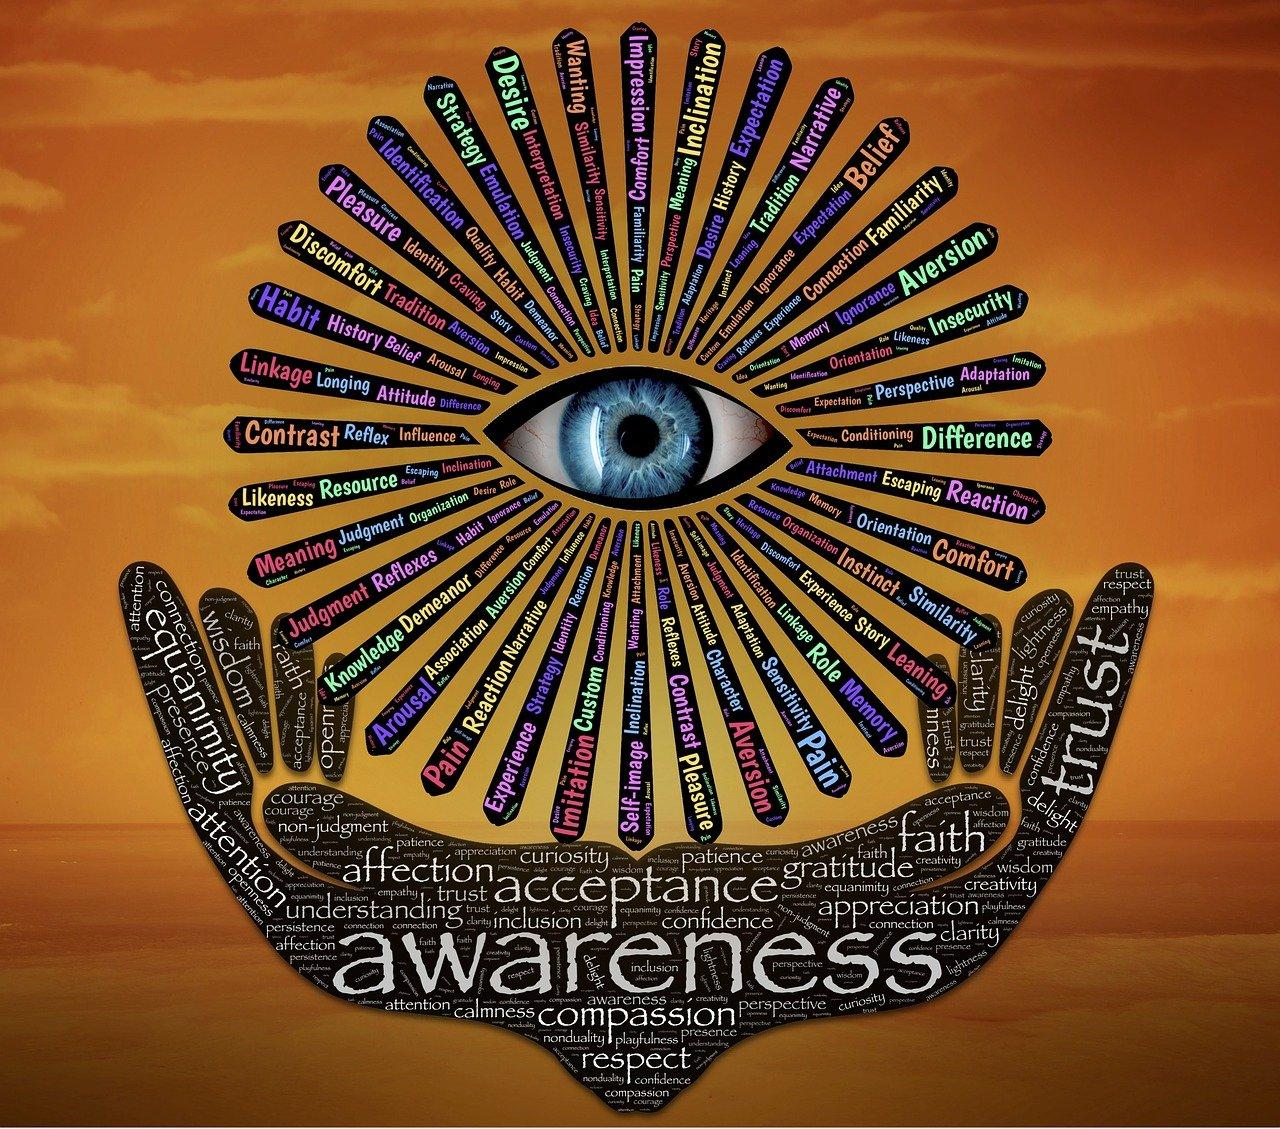 revelation, transformation, awareness-2937691.jpg